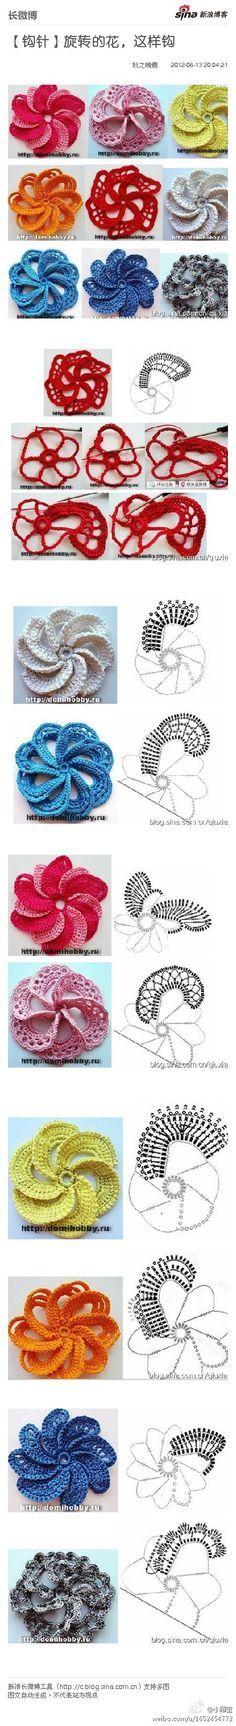 flor azul jardim secreto : flor azul jardim secreto:Crochet Flower Chart